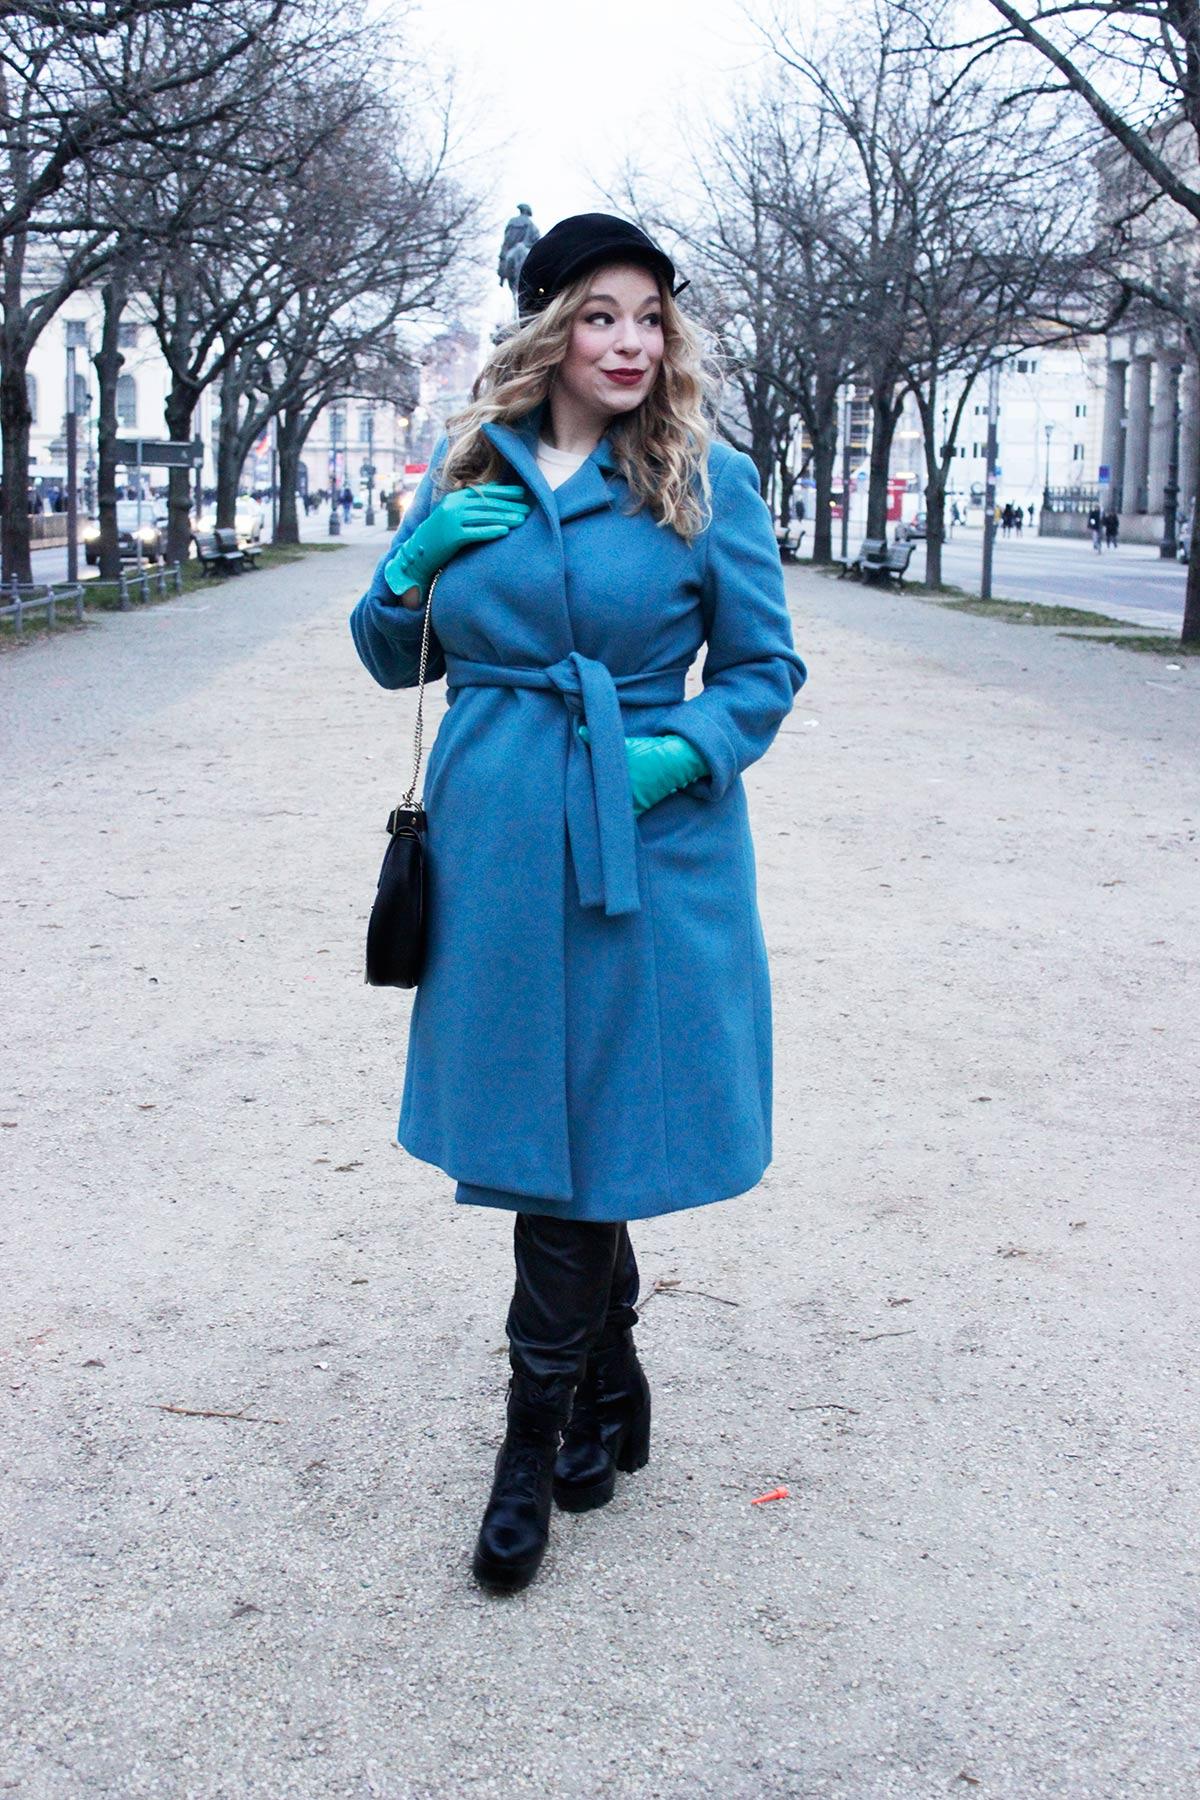 Caterina-marina-rinaldi pogorzelski-curvy-Megabambi-Model-moderatorin